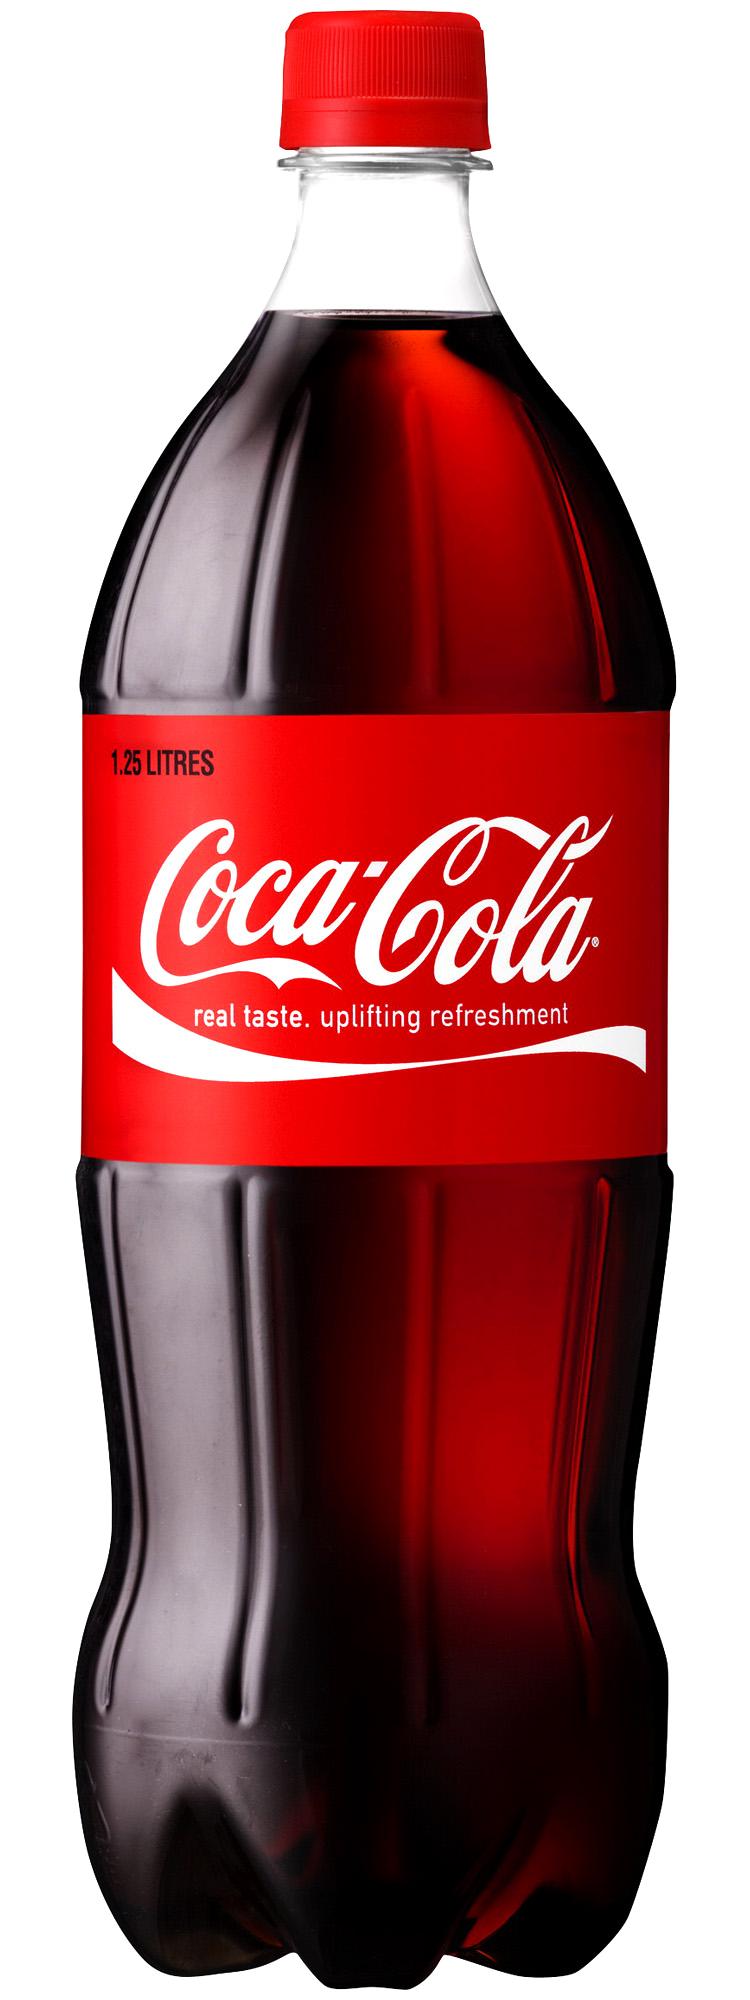 Coca Cola Bottle Png Image - Coke, Transparent background PNG HD thumbnail